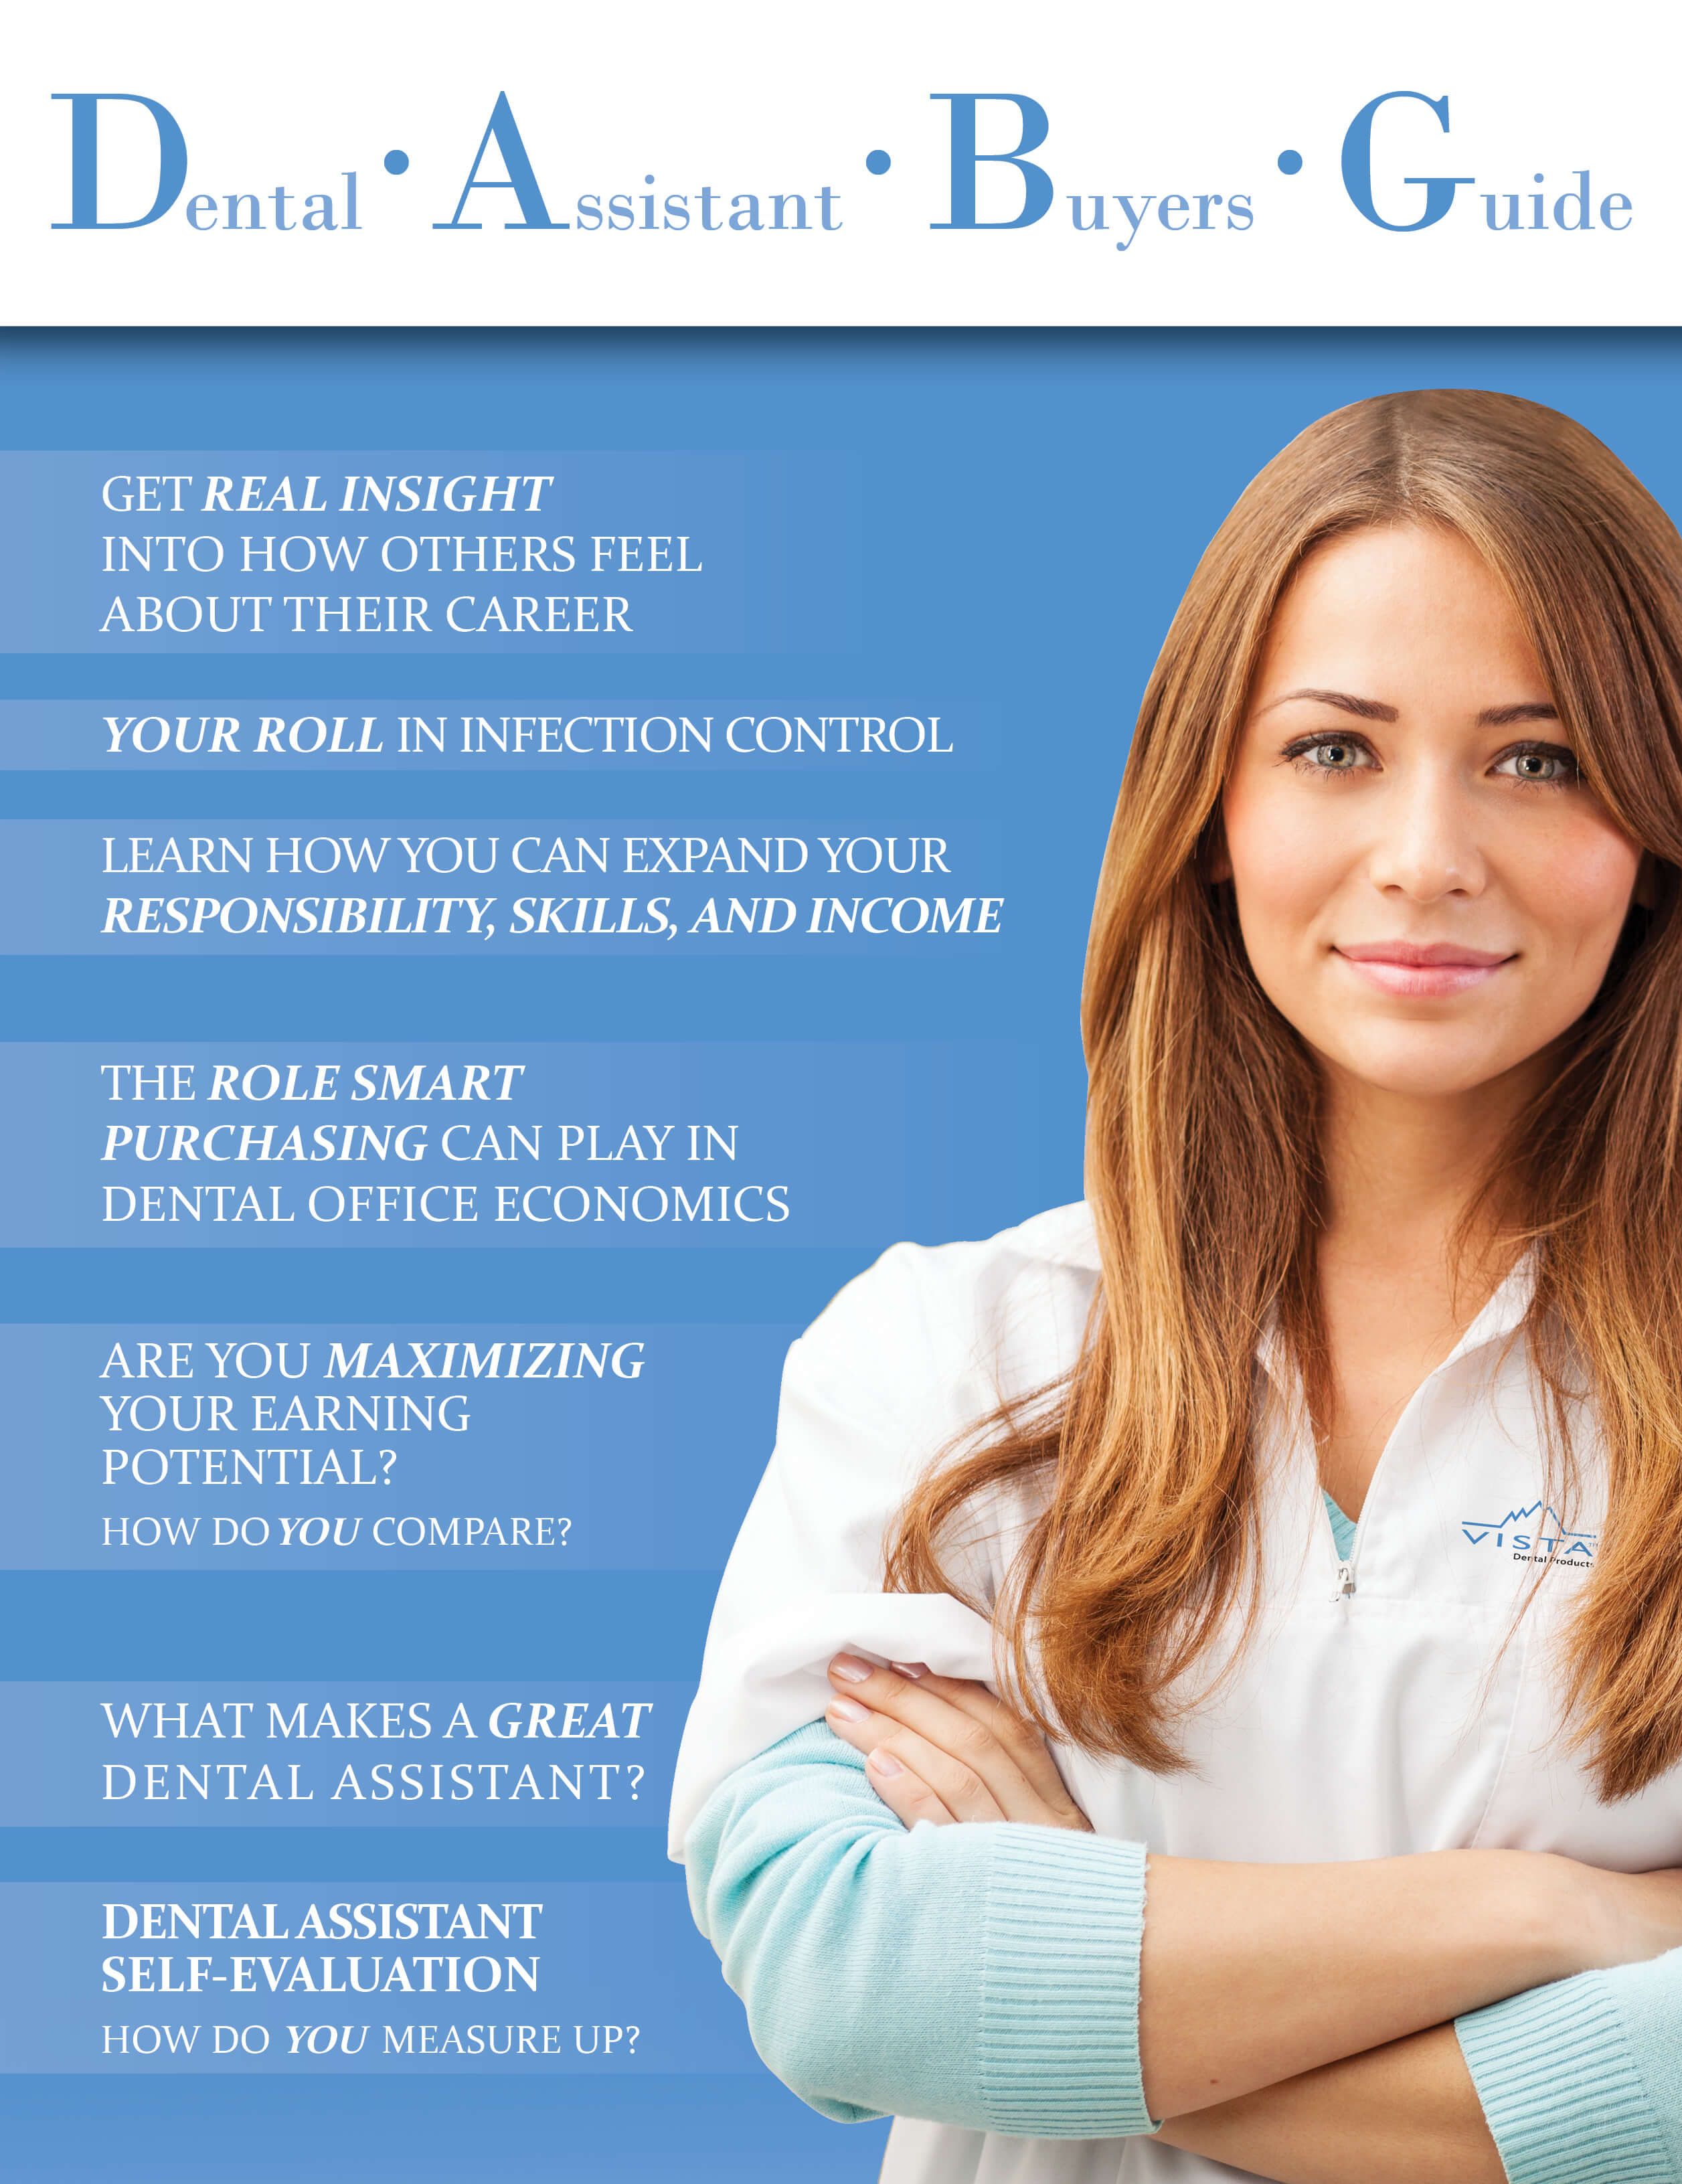 2018-dentalassistantbuyersguide-dabg-cover-.jpg